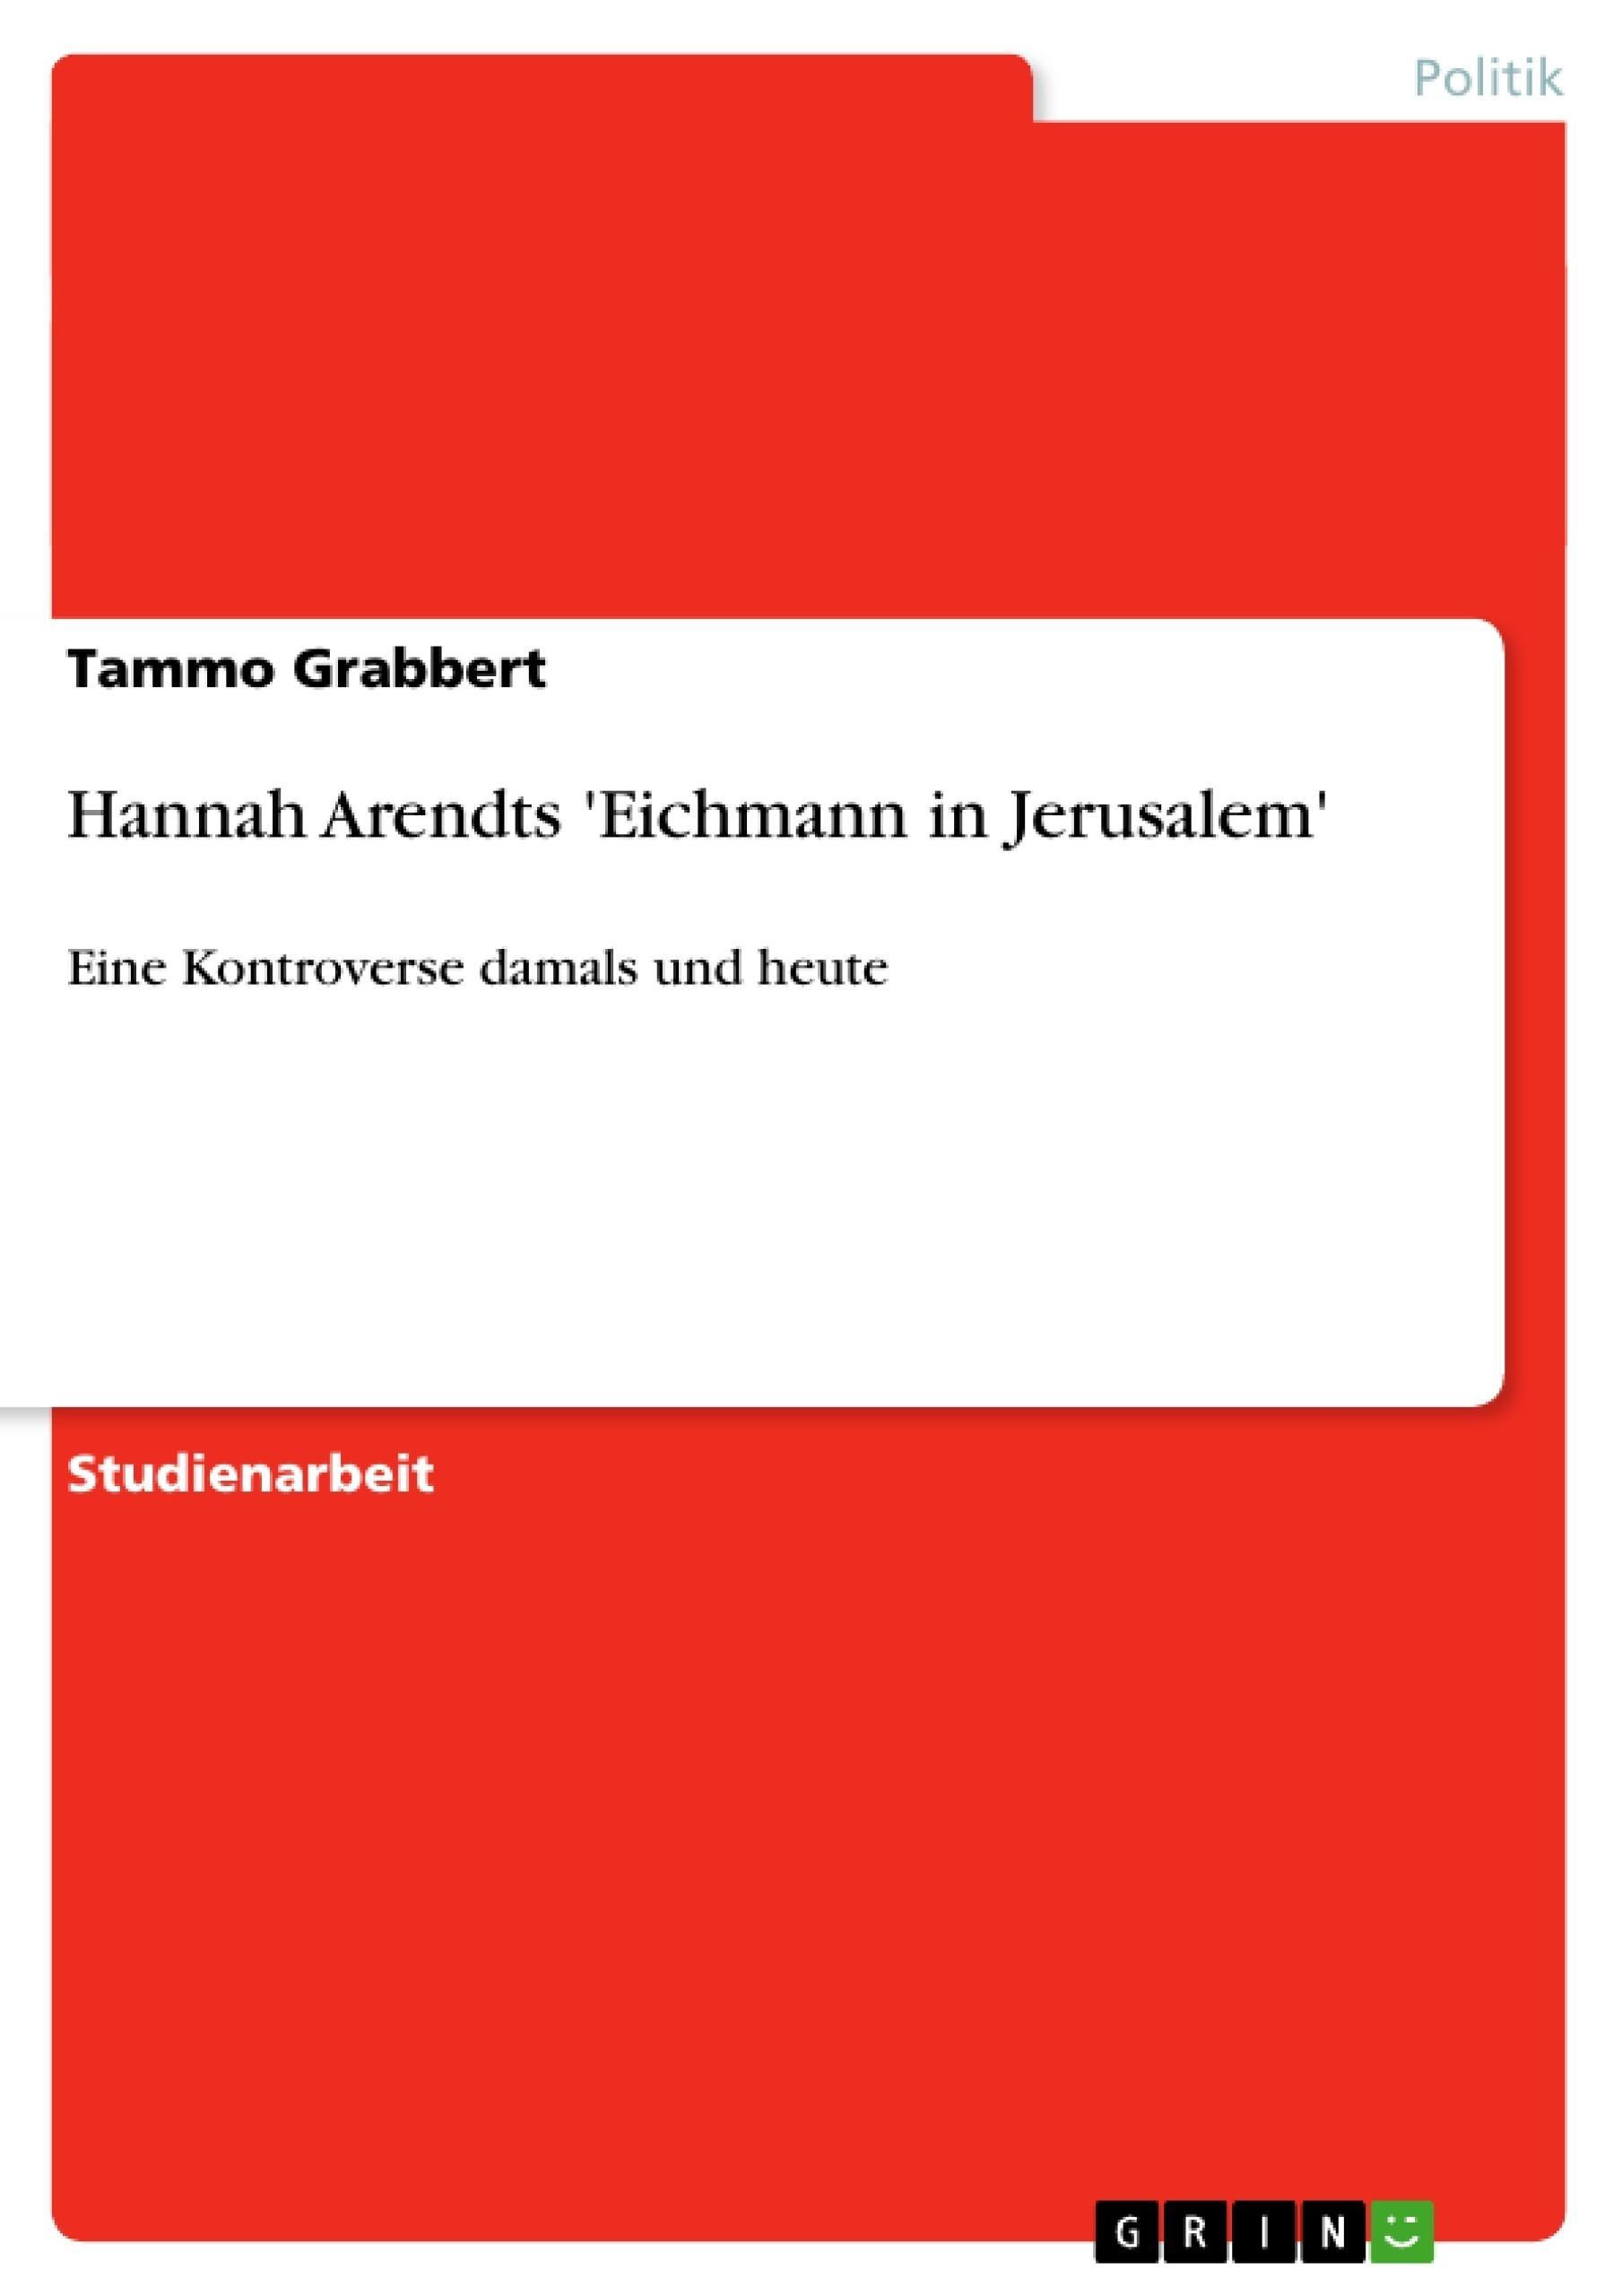 Titel: Hannah Arendts 'Eichmann in Jerusalem'